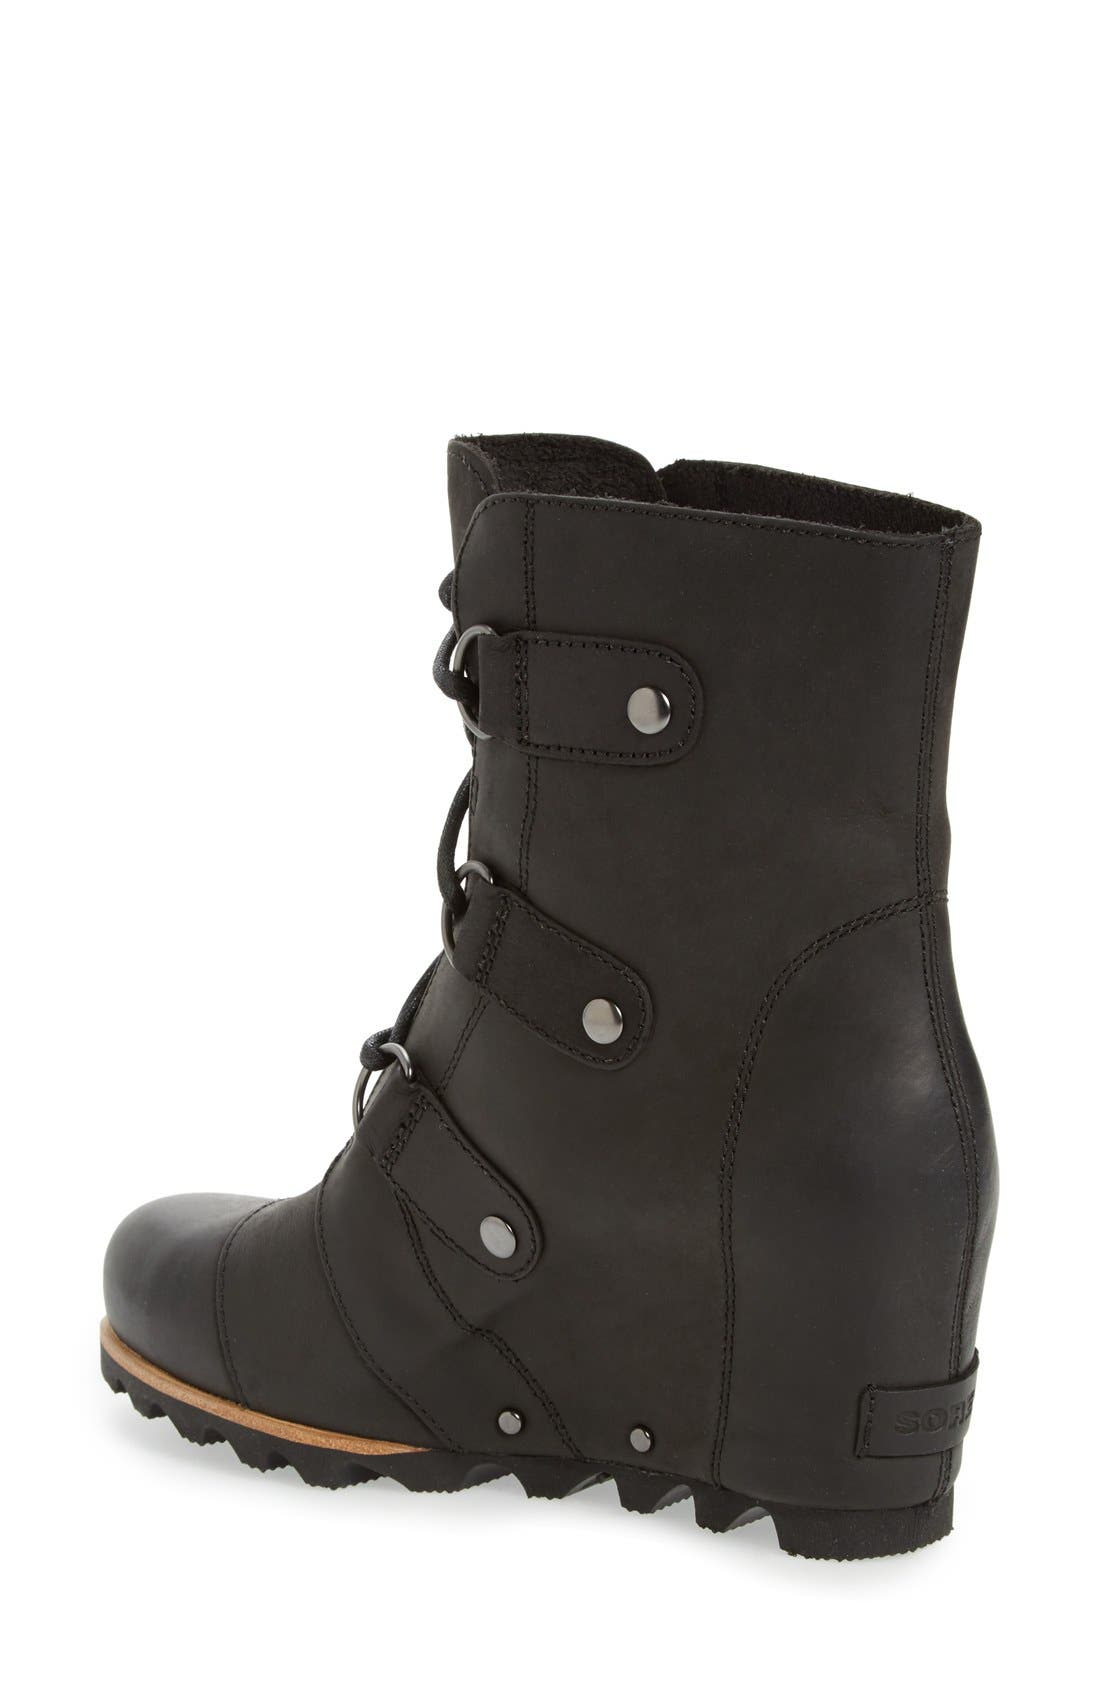 Alternate Image 2  - SOREL 'Joan of Arctic' Waterproof Wedge Boot (Women)